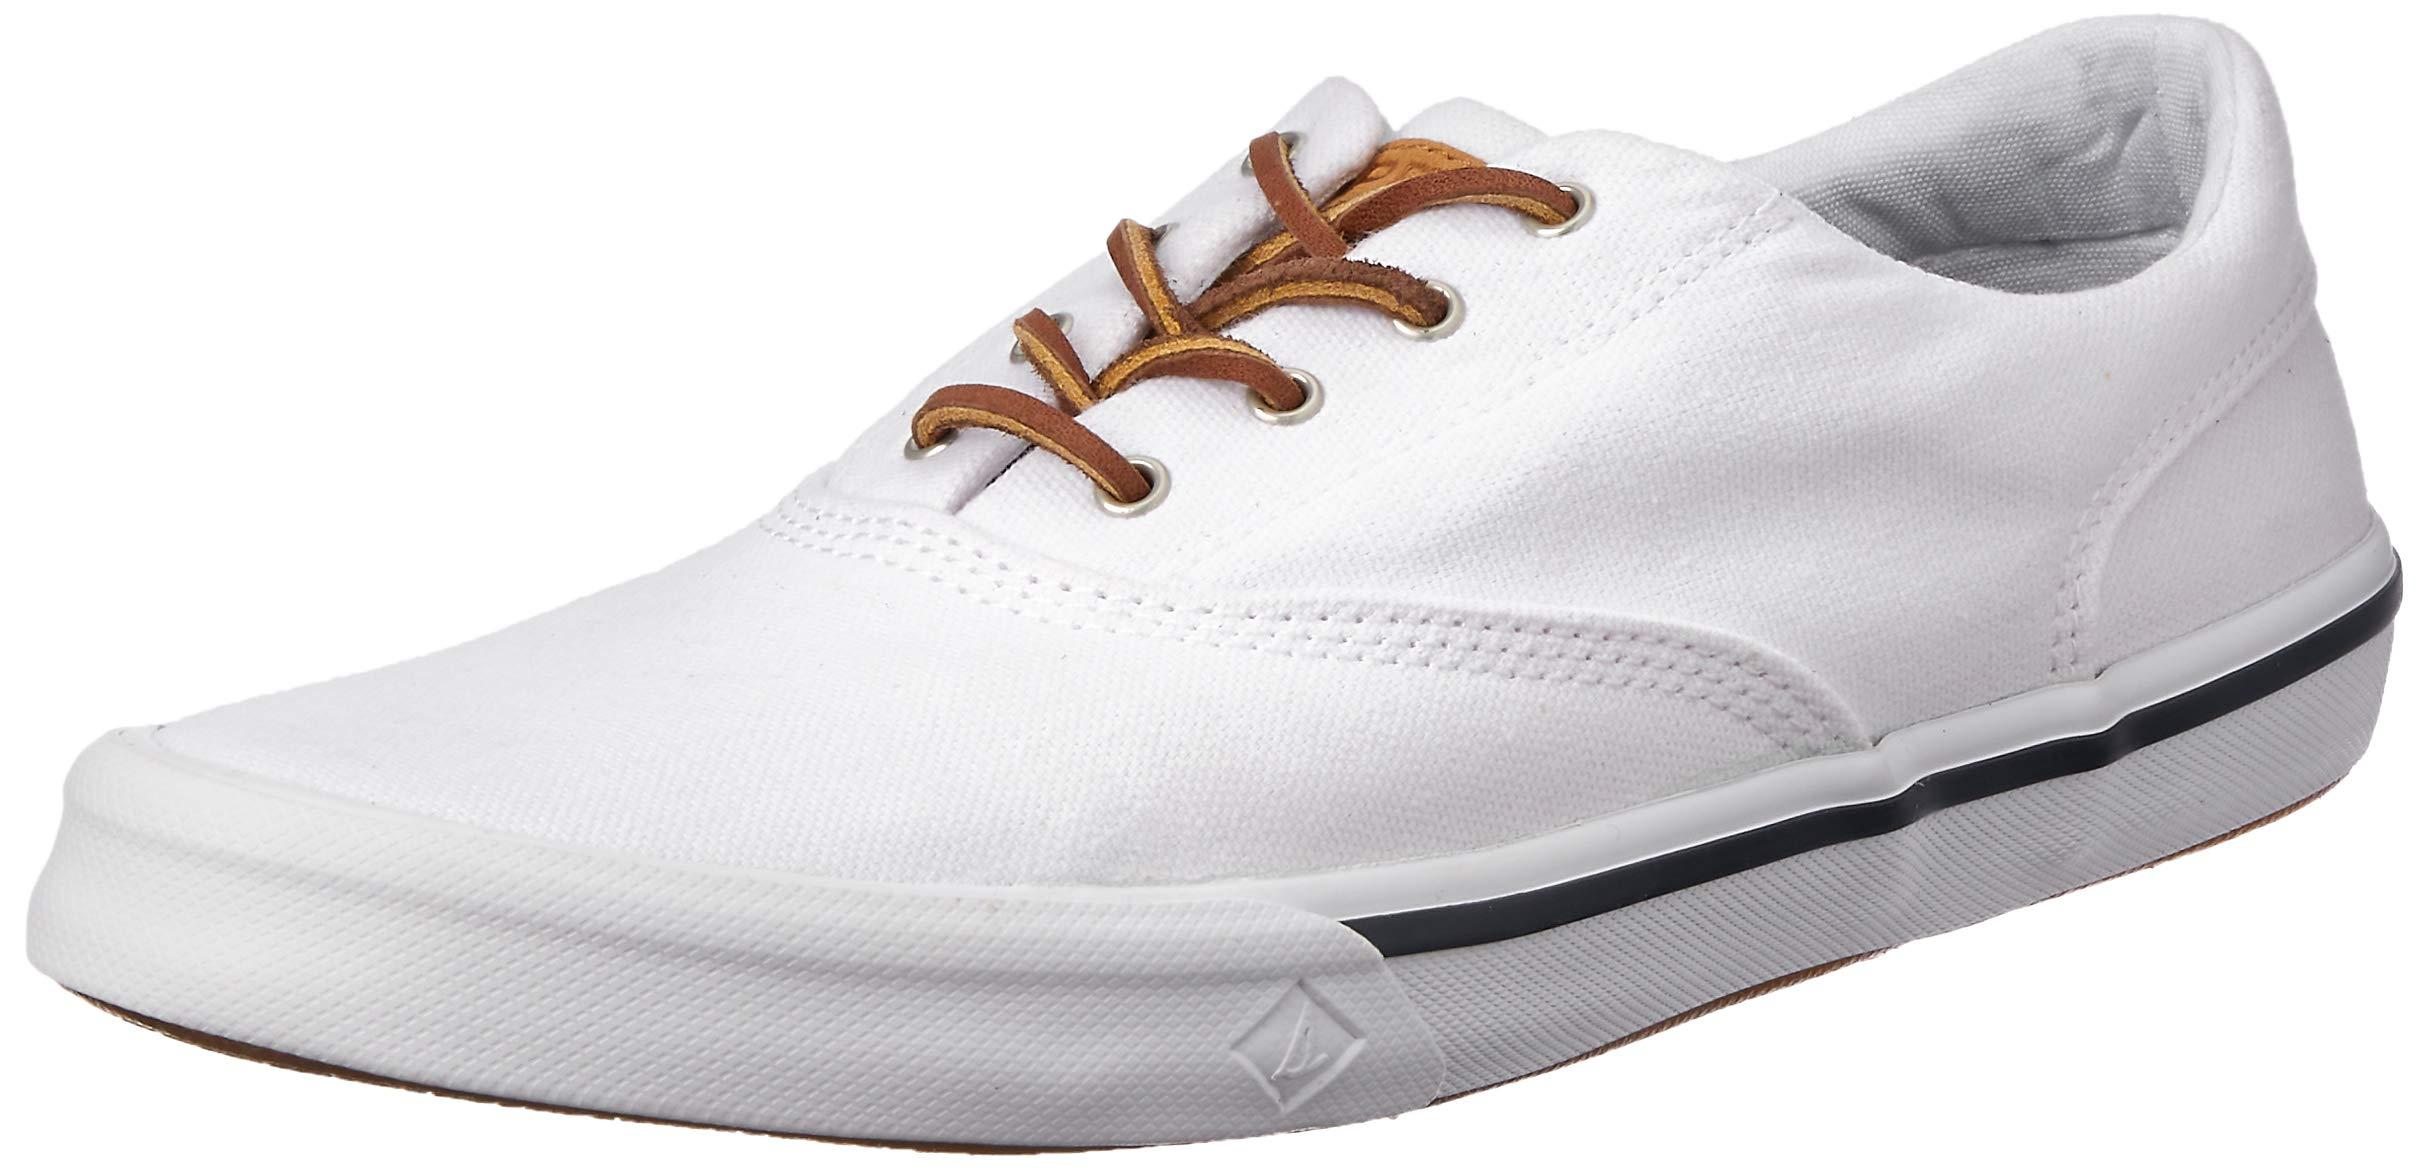 Striper II CVO Washed Sneaker